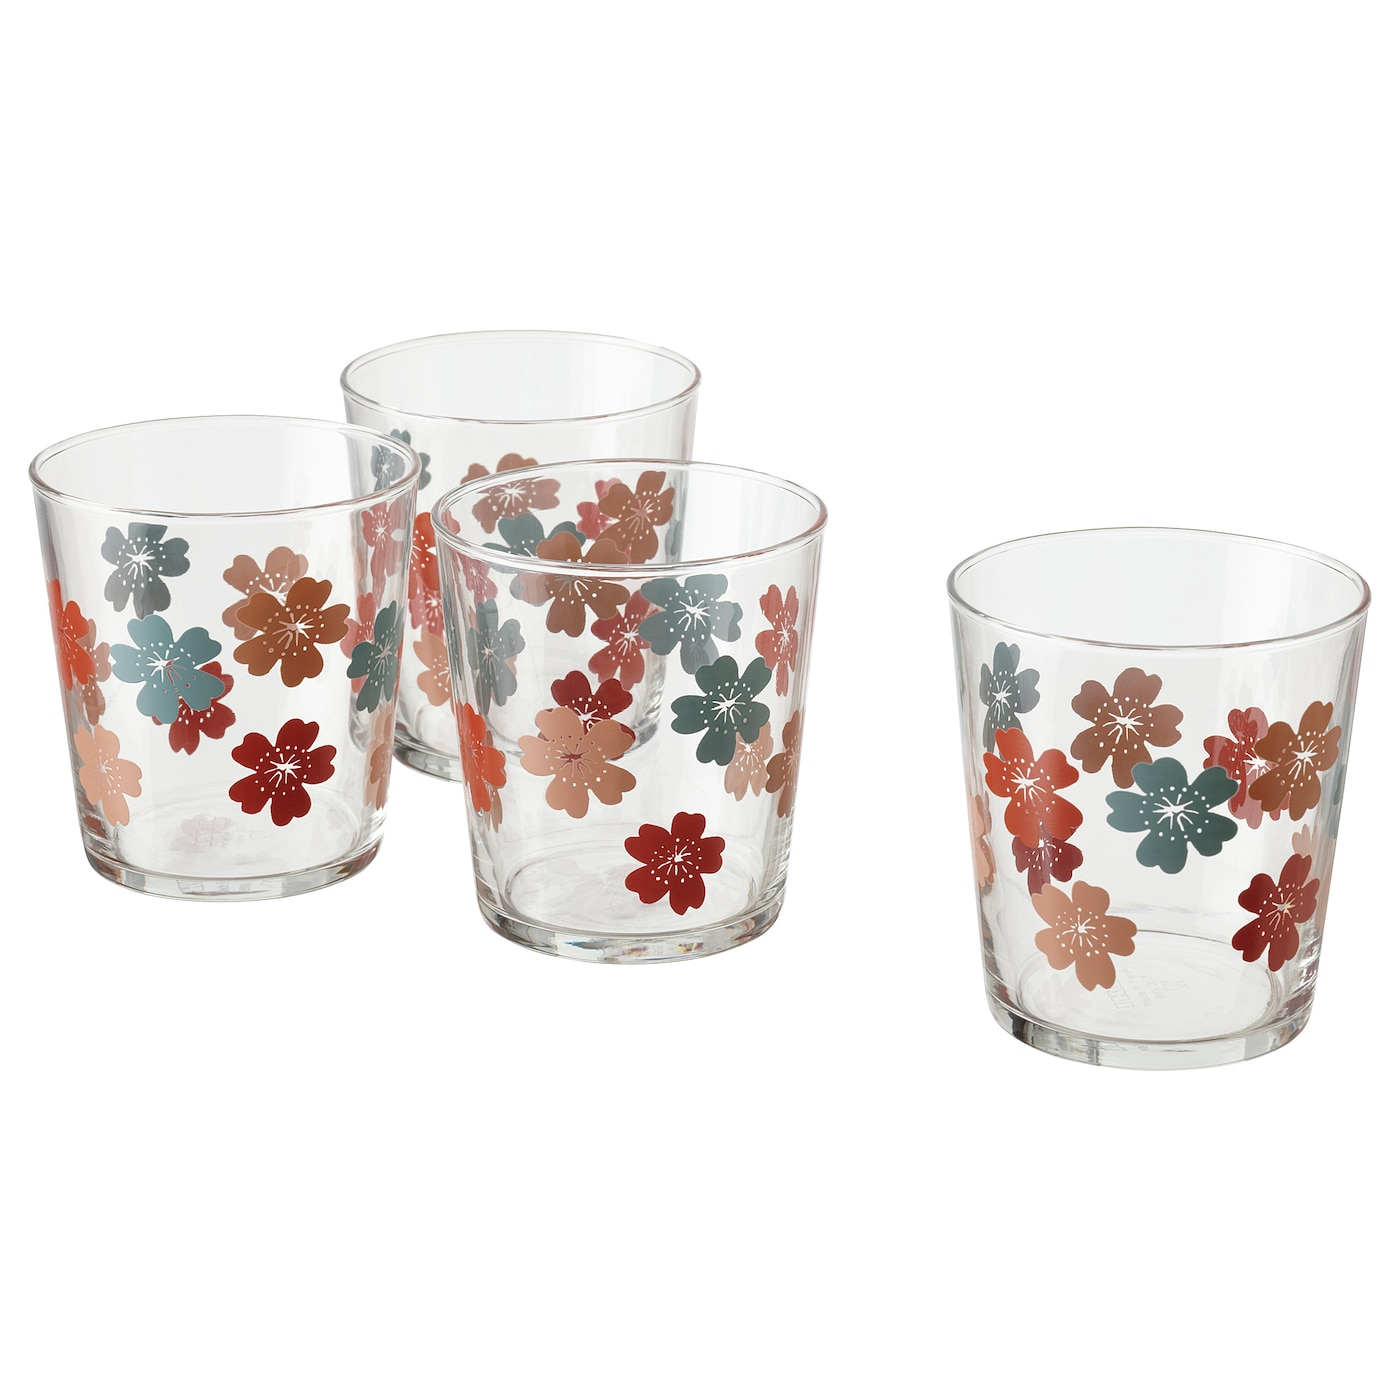 VÅRFINT Glas - Glas/gemustert 30 cl